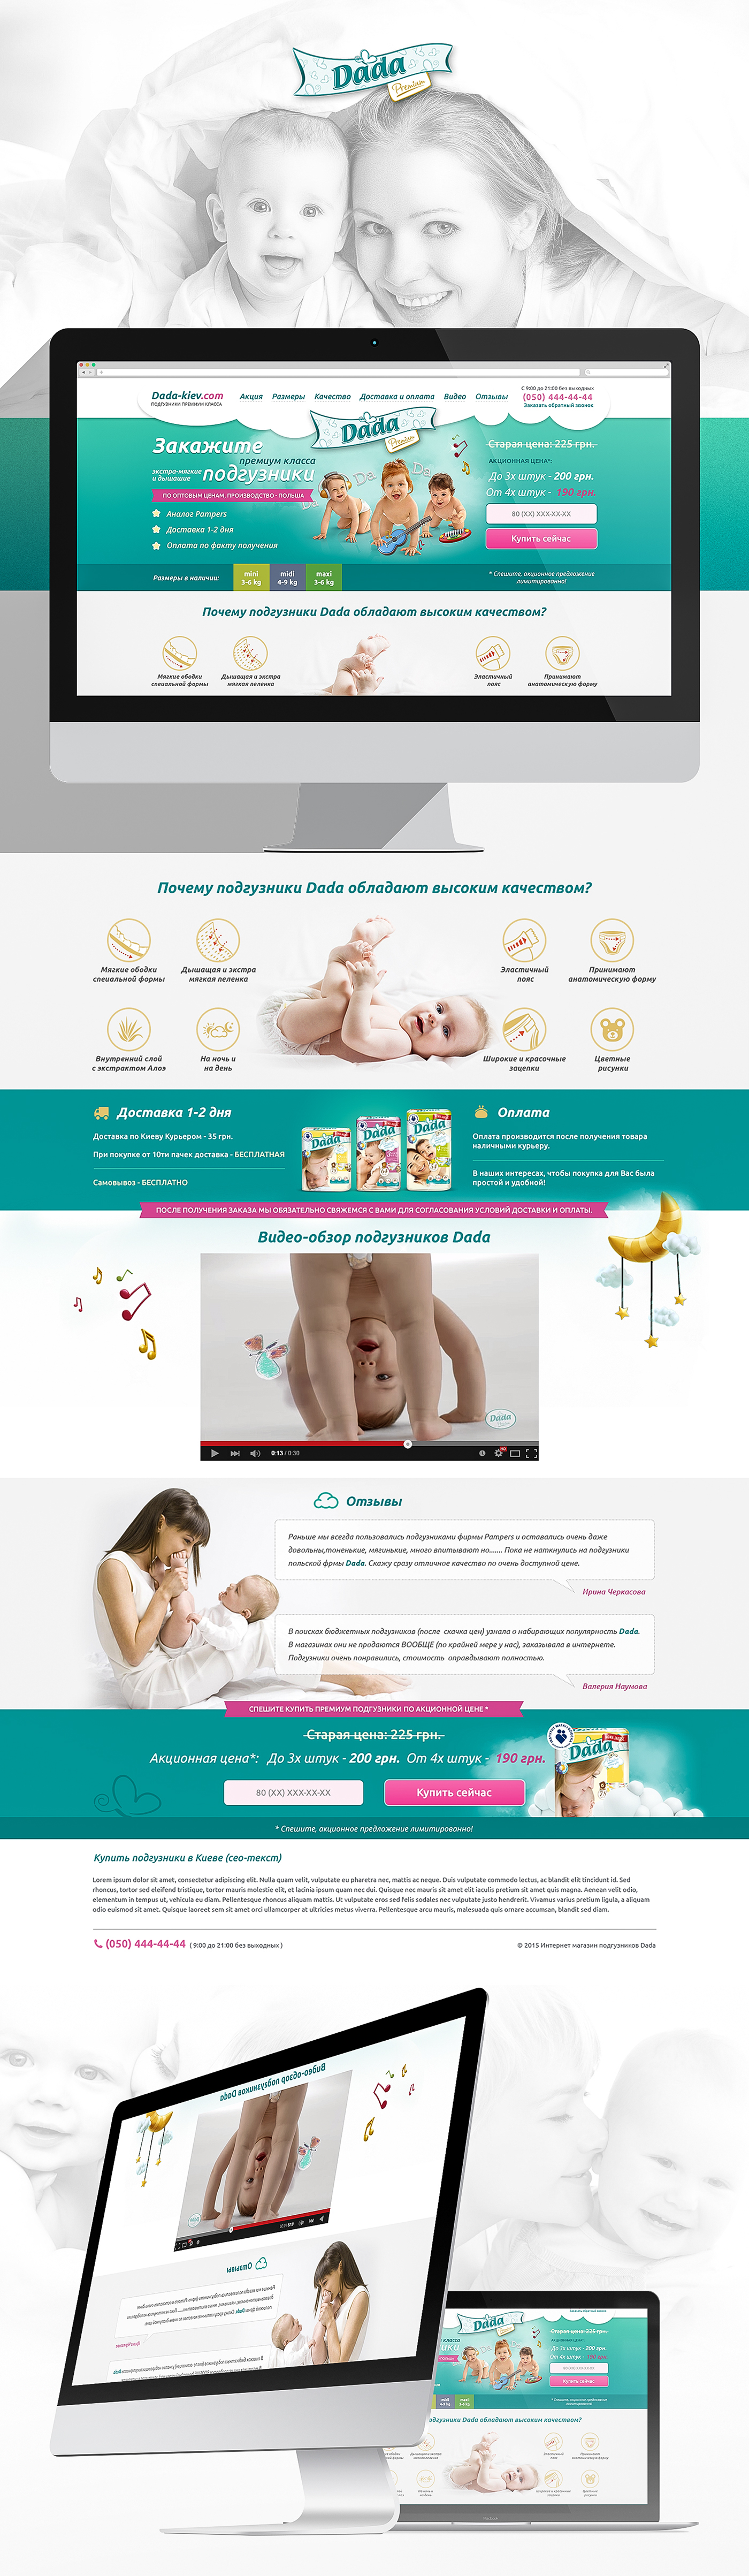 dada premium dada kiev kiev Website Web Design